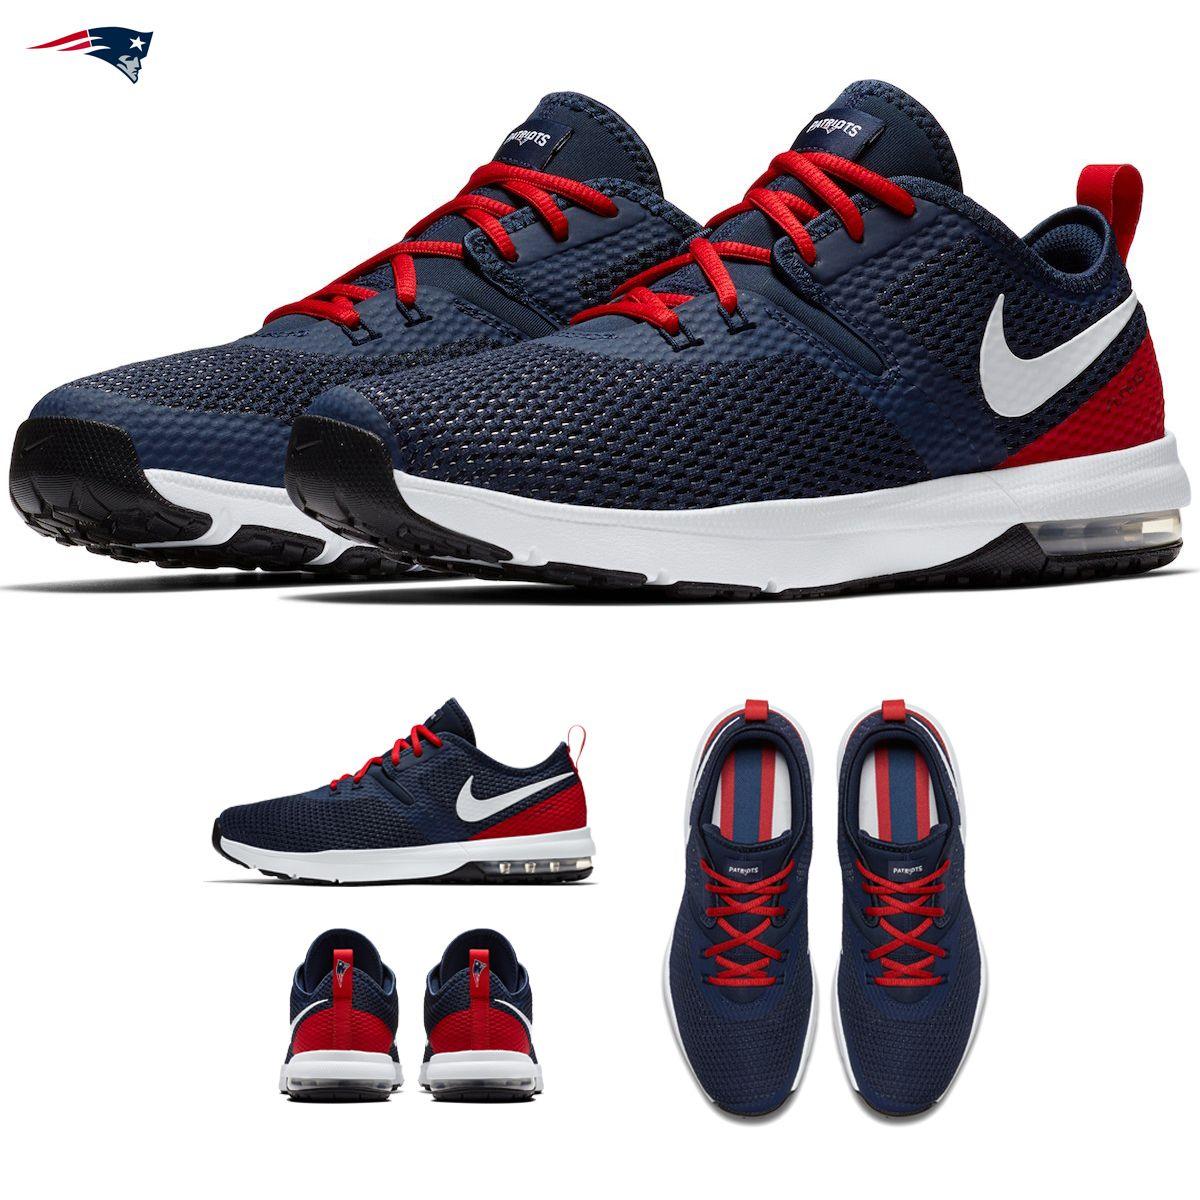 New England Patriots Nike Air Max Typha